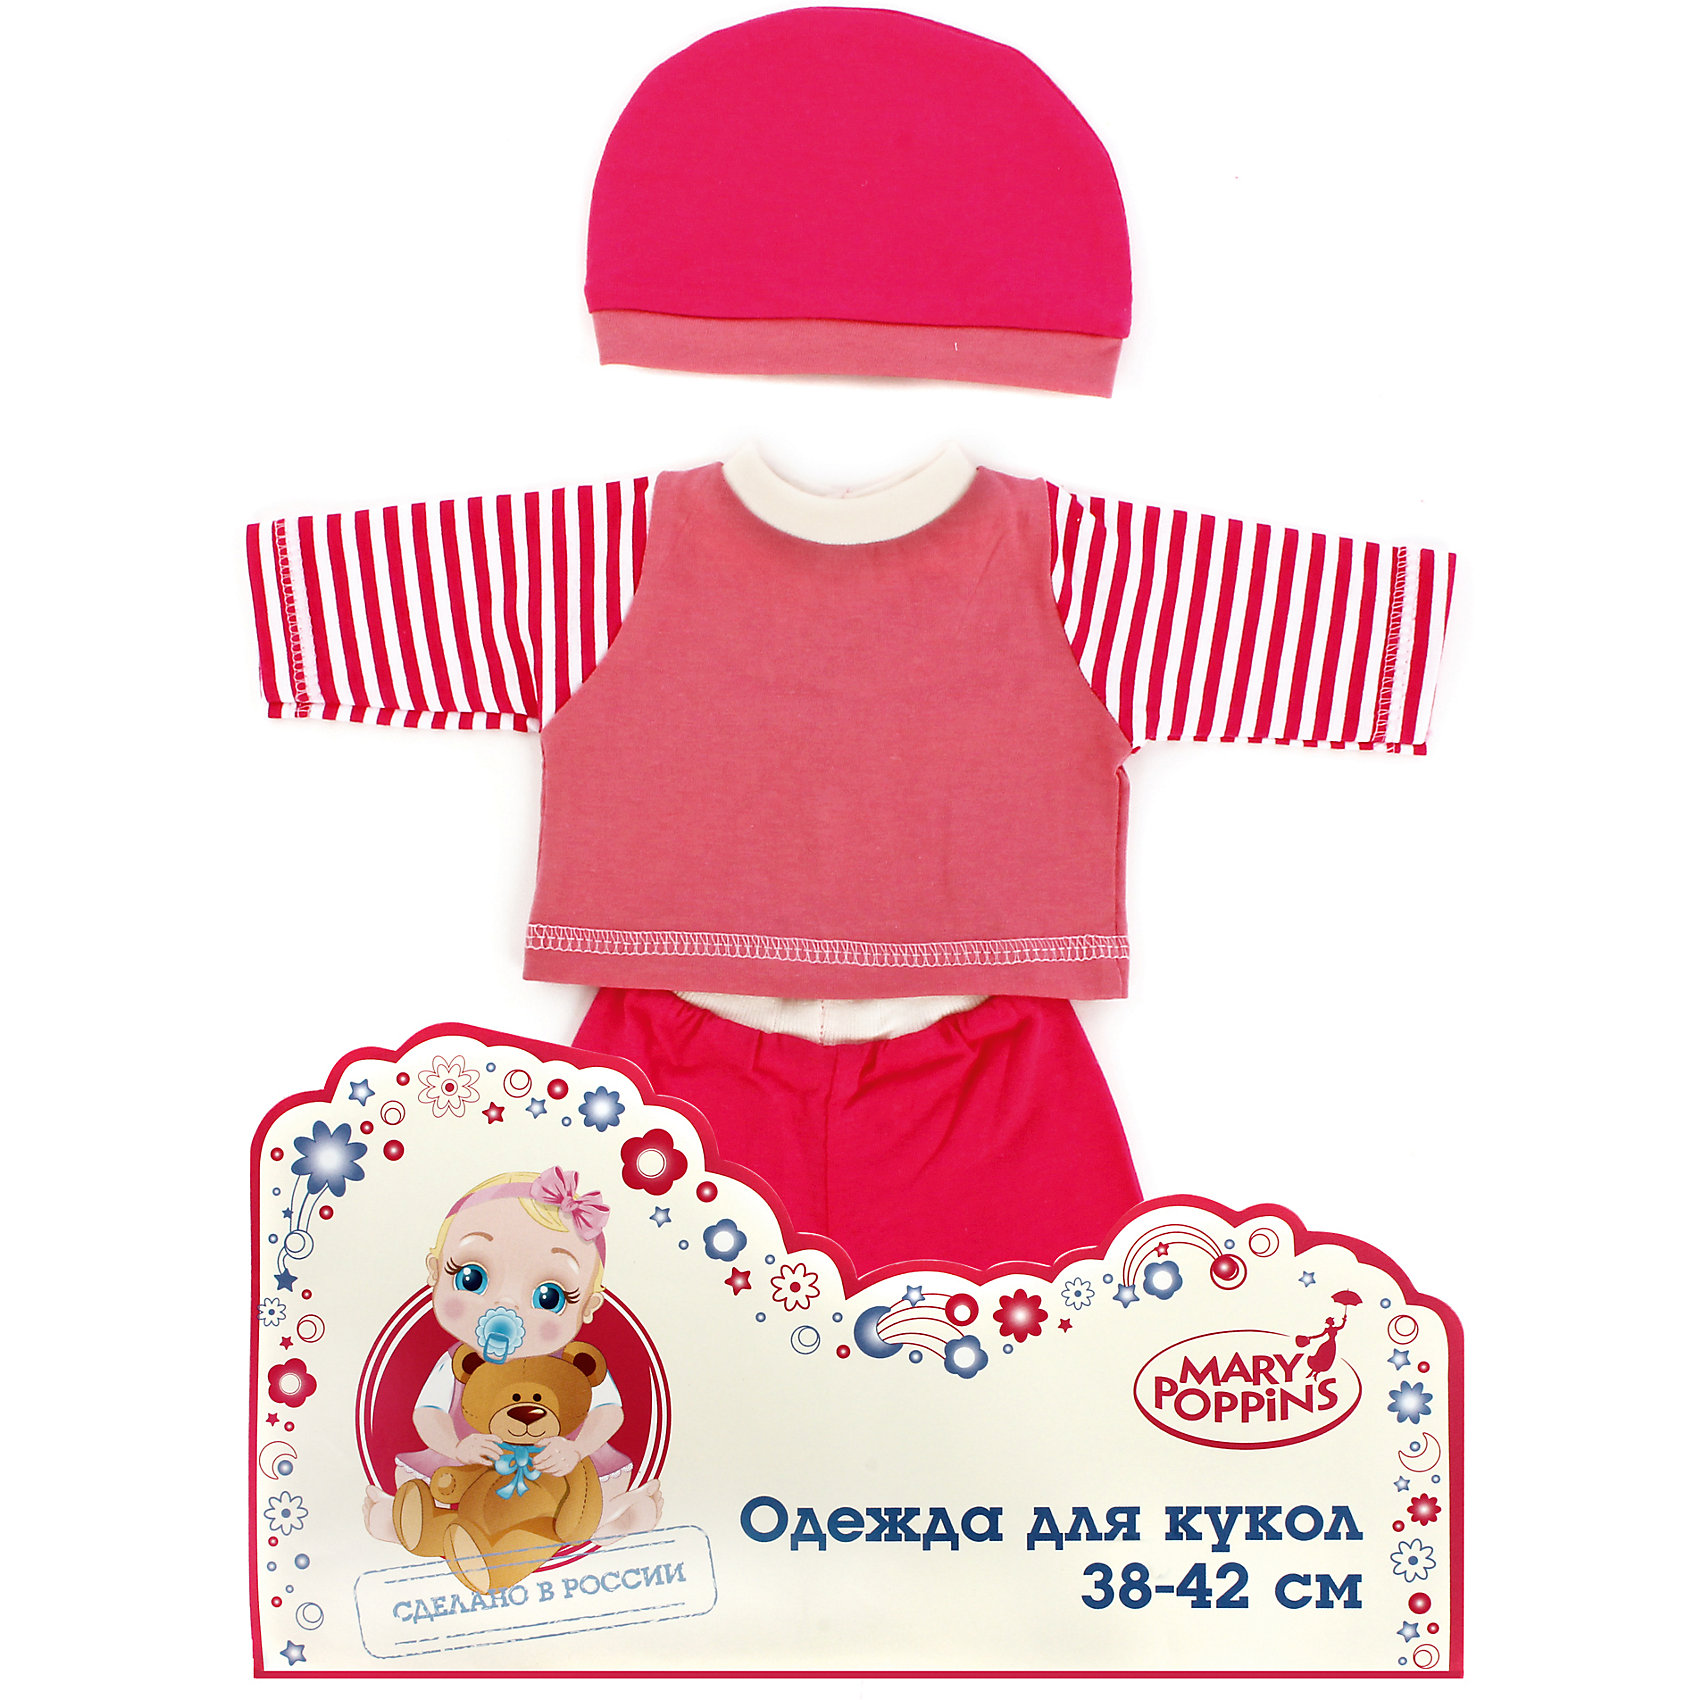 Mary Poppins Одежда для куклы 42 см, кофточка, брючки и шапочка, Mary Poppins, в ассортименте куклы и одежда для кукол bayer малышка первый поцелуй 42 см